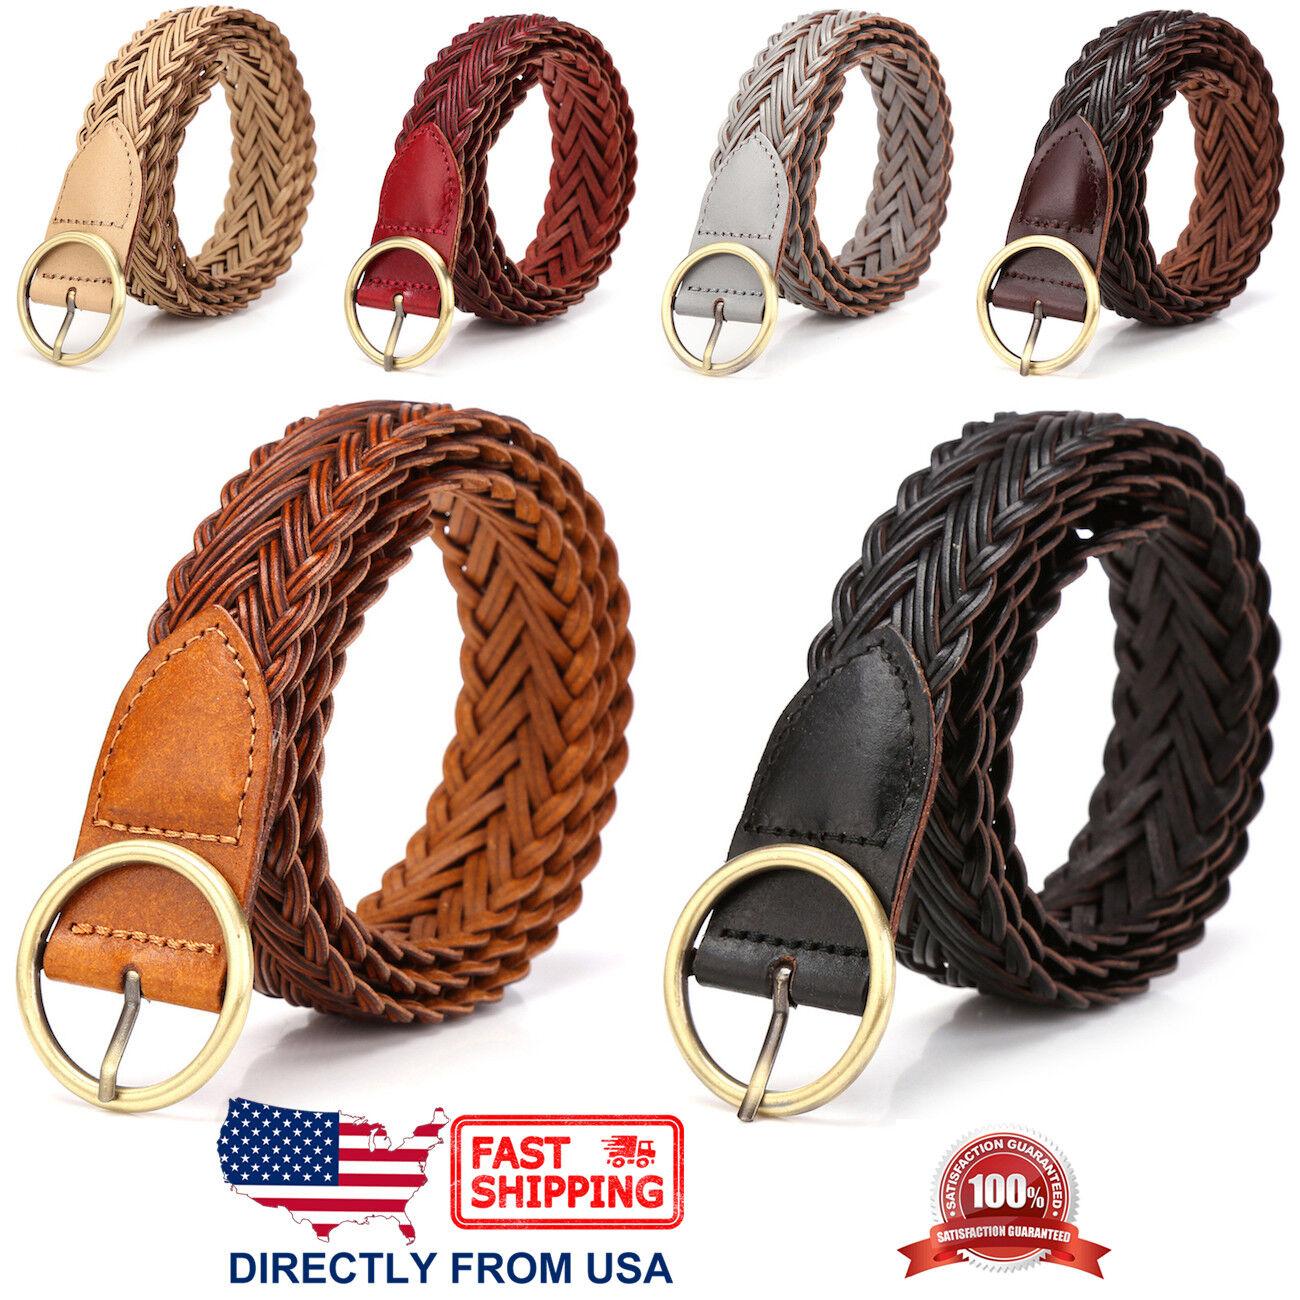 Women's Casual Belt, Handcrafted Braided Leather Belt Belts